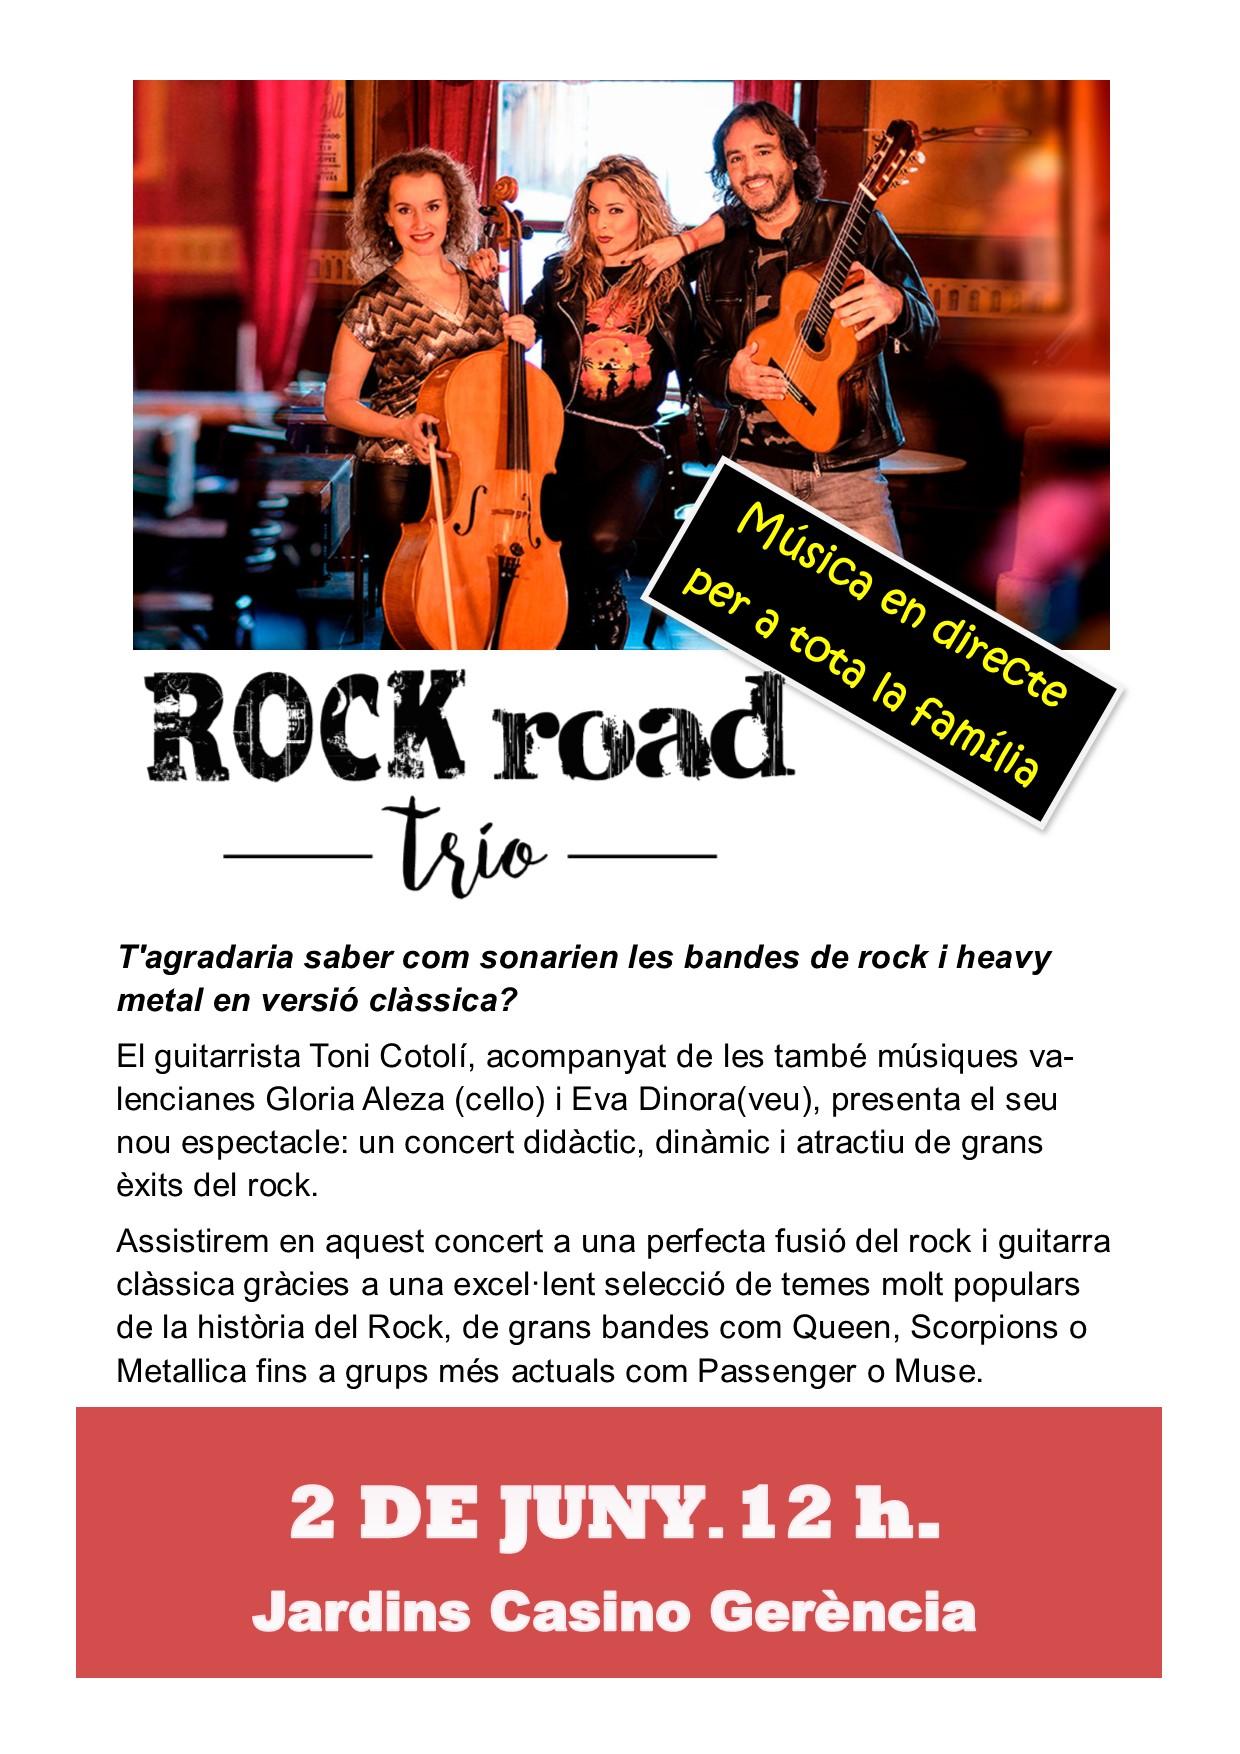 rock road trio whatsapp